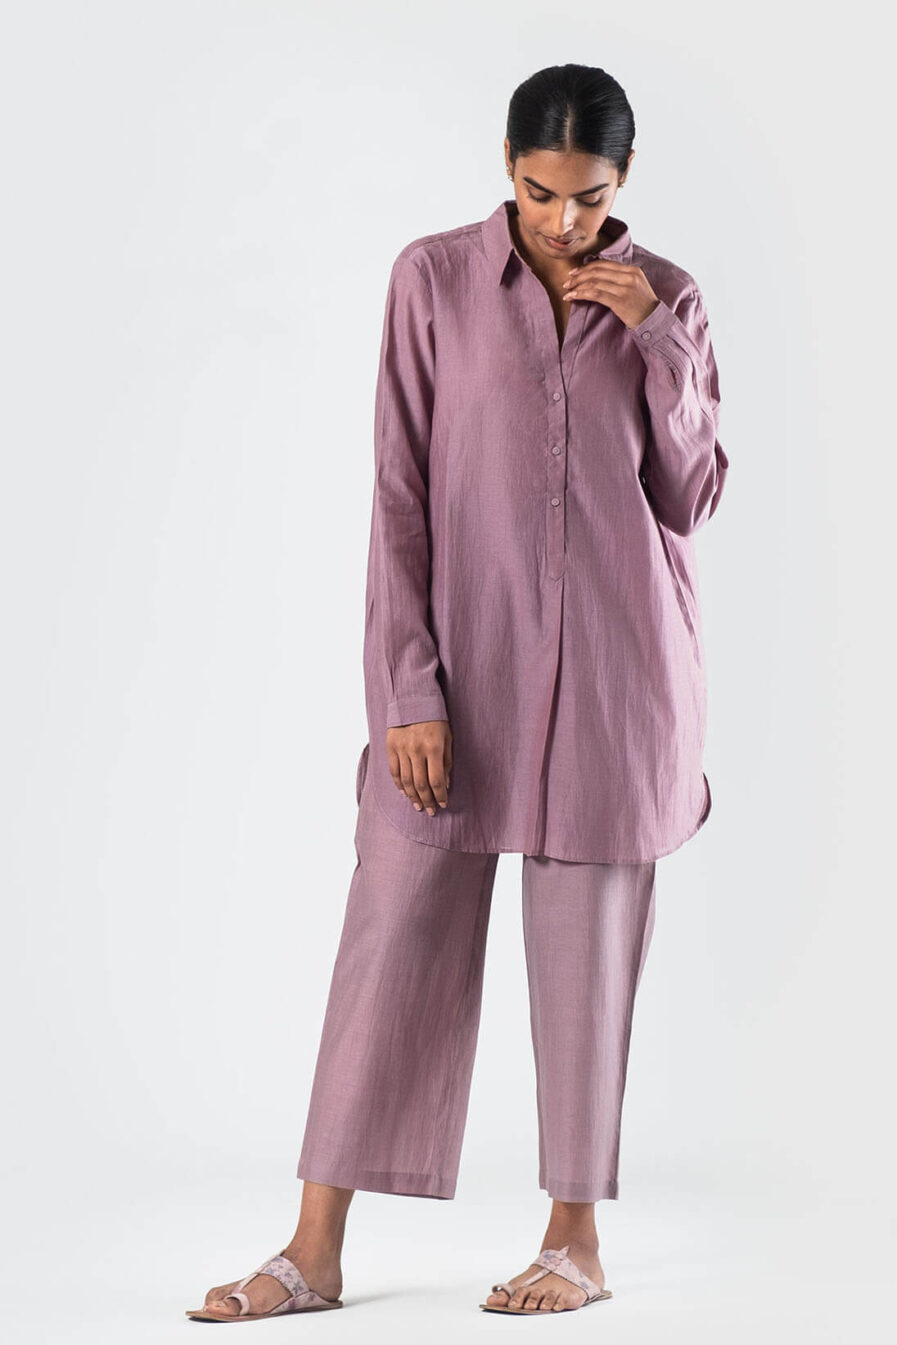 Anavila Lavender Brooke cotton silk shirt